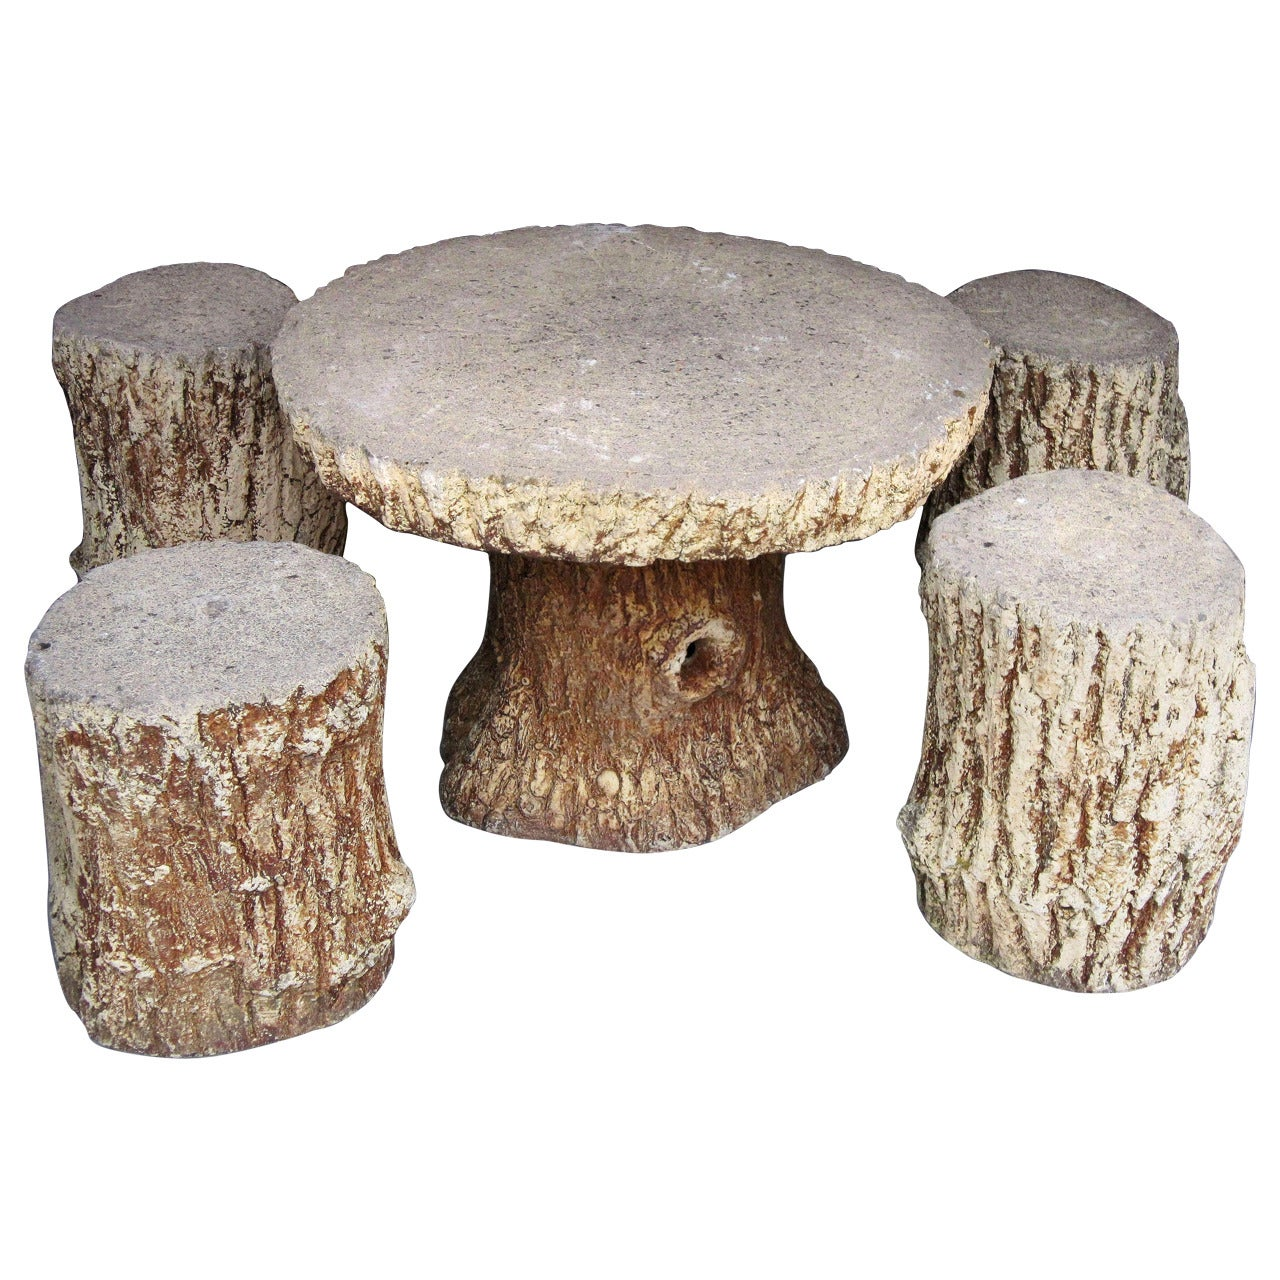 Faux Bois Garden Stone Set, Table And Four Stools